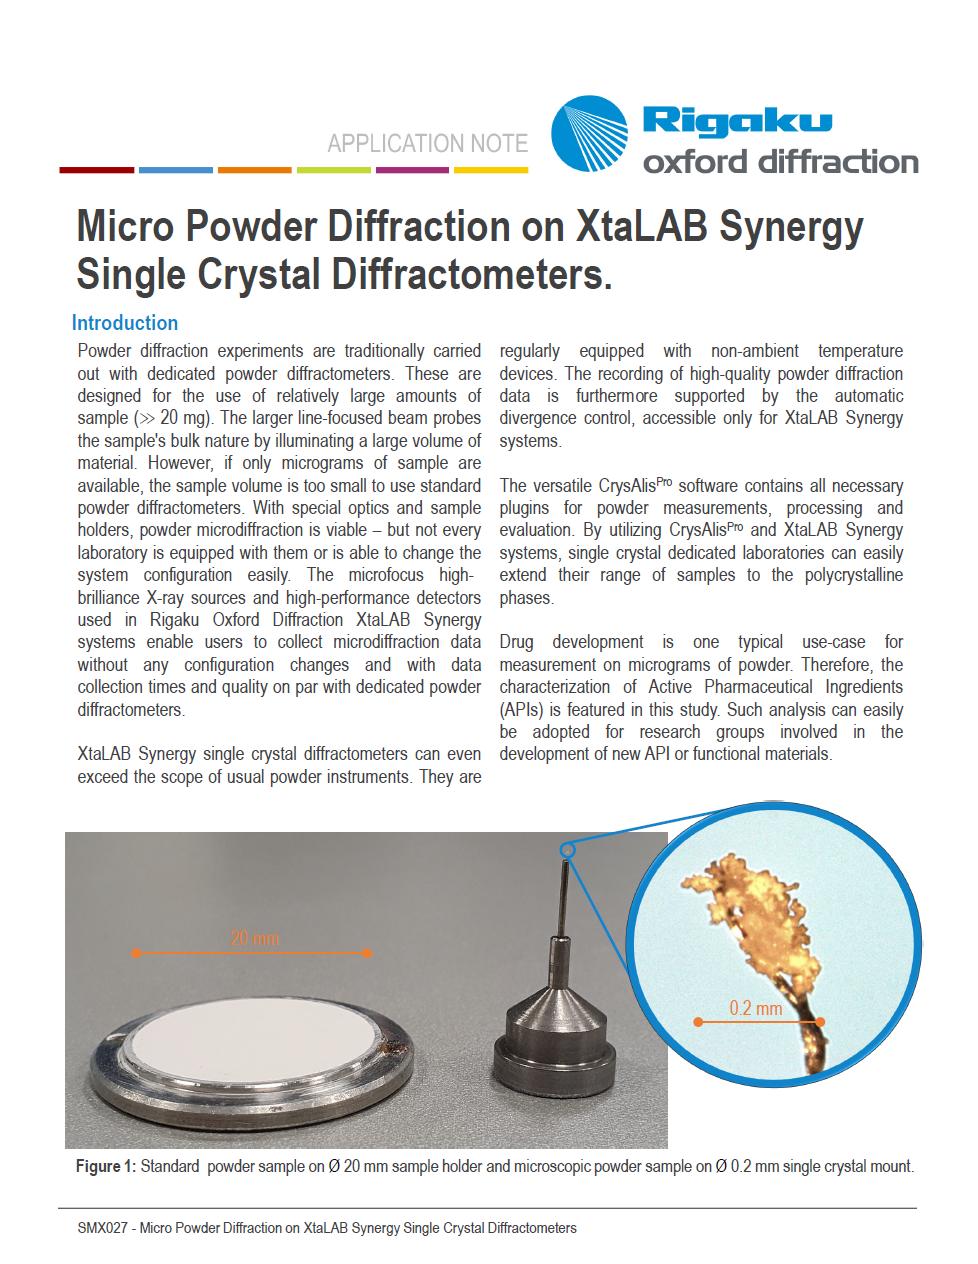 Micro Powder Diffraction App Note Thumbnail